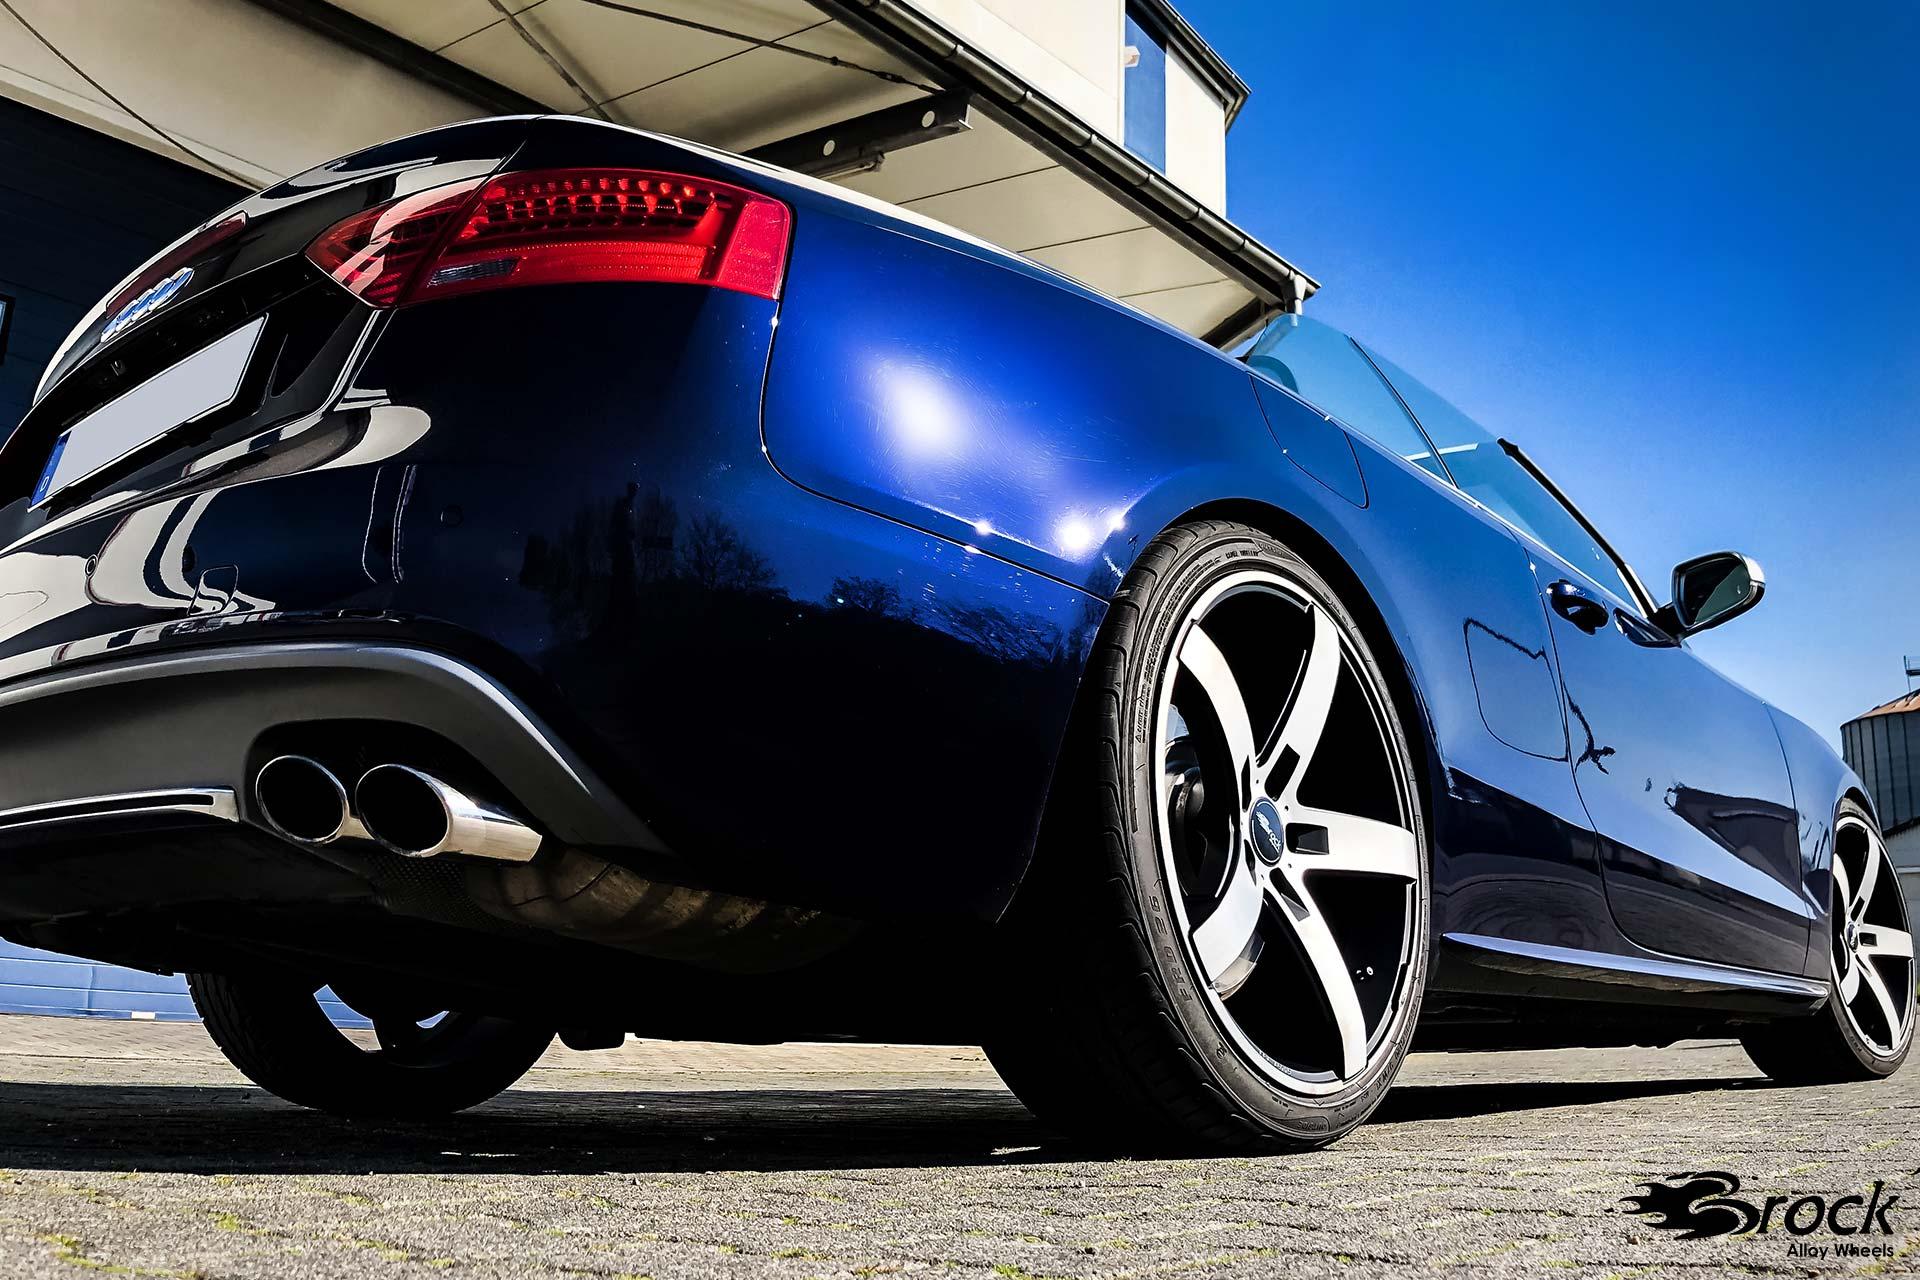 Audi S5 Brock B35 SMVP